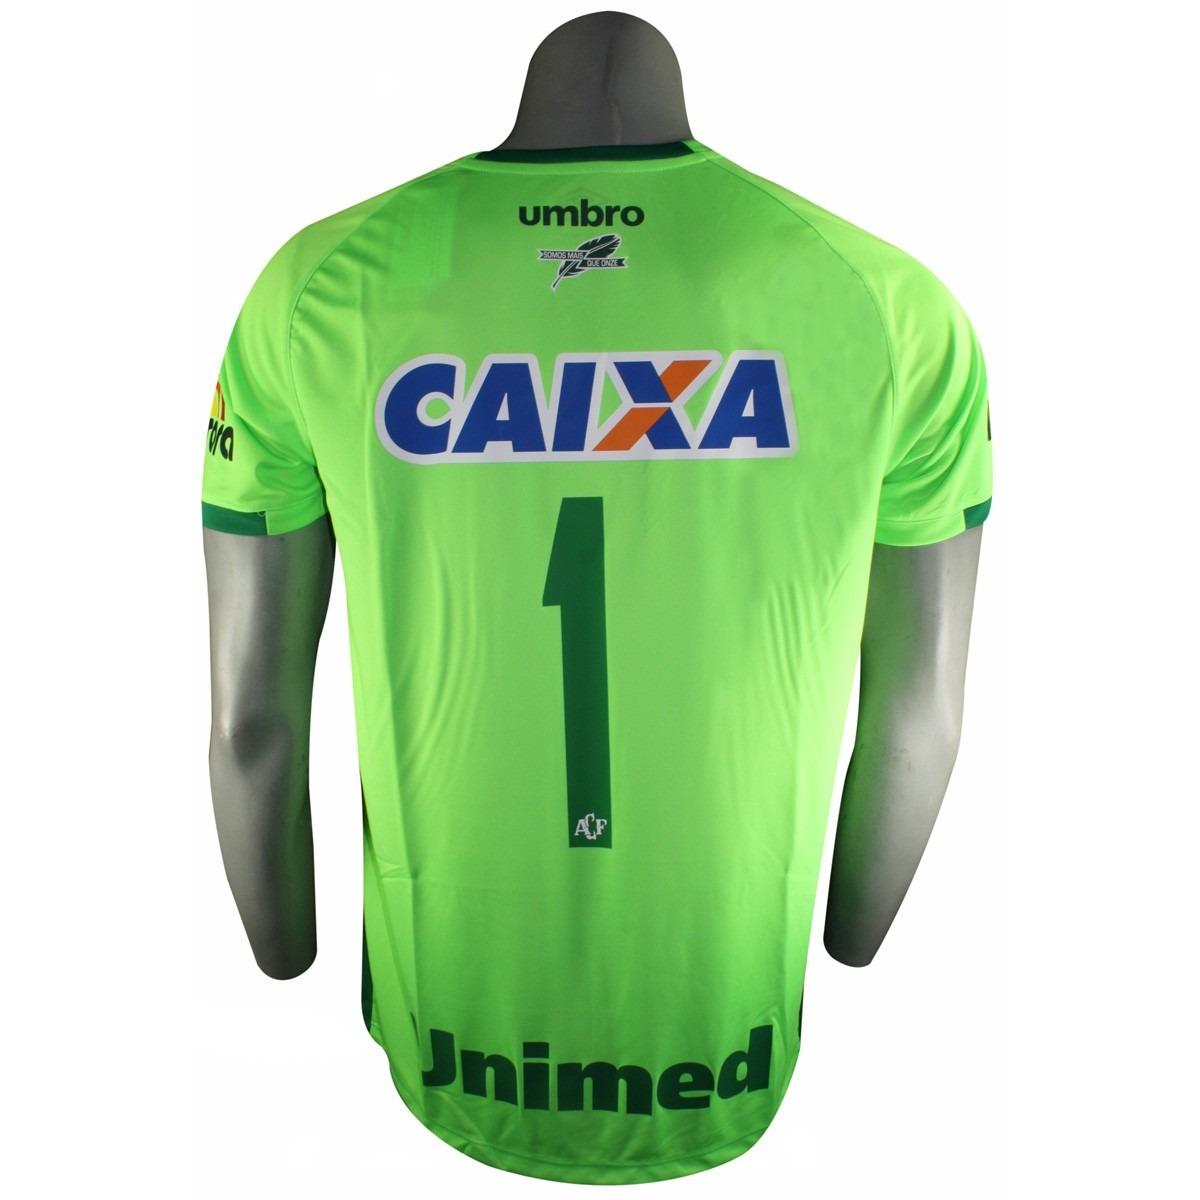 Camisa Goleiro Chapecoense Umbro 3a05002  79de482d594f9